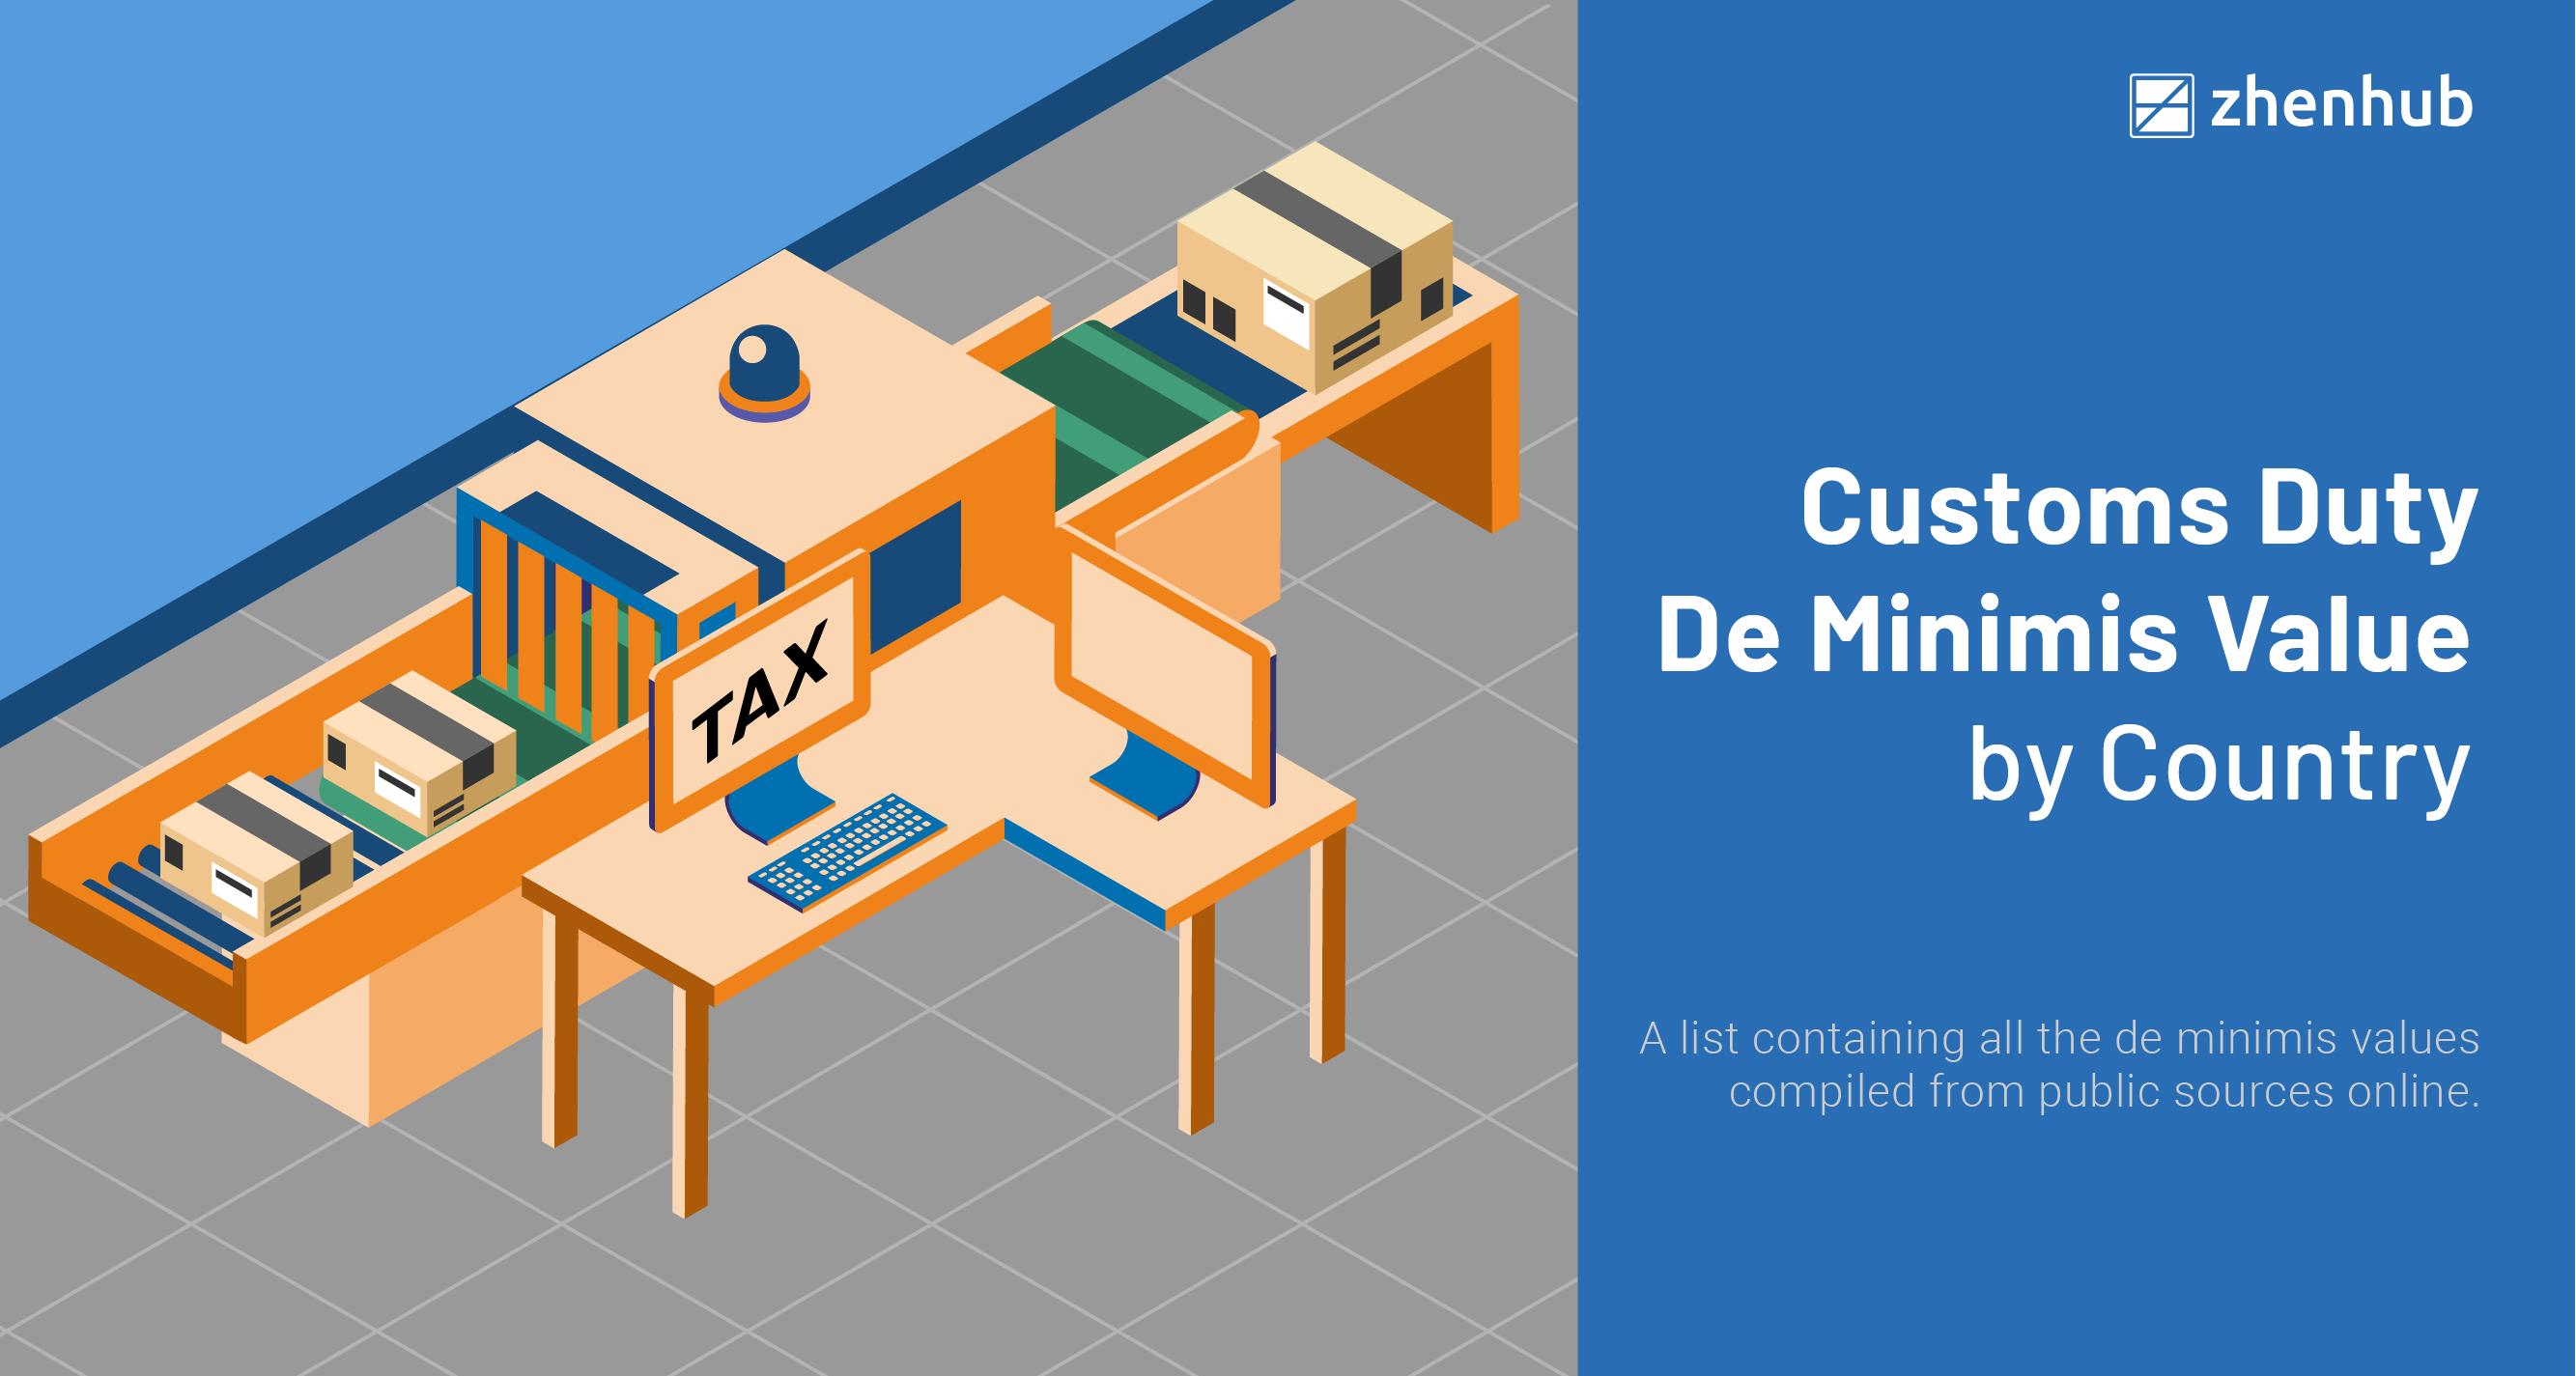 customs-duty-de-minimis-value-by-country-2020